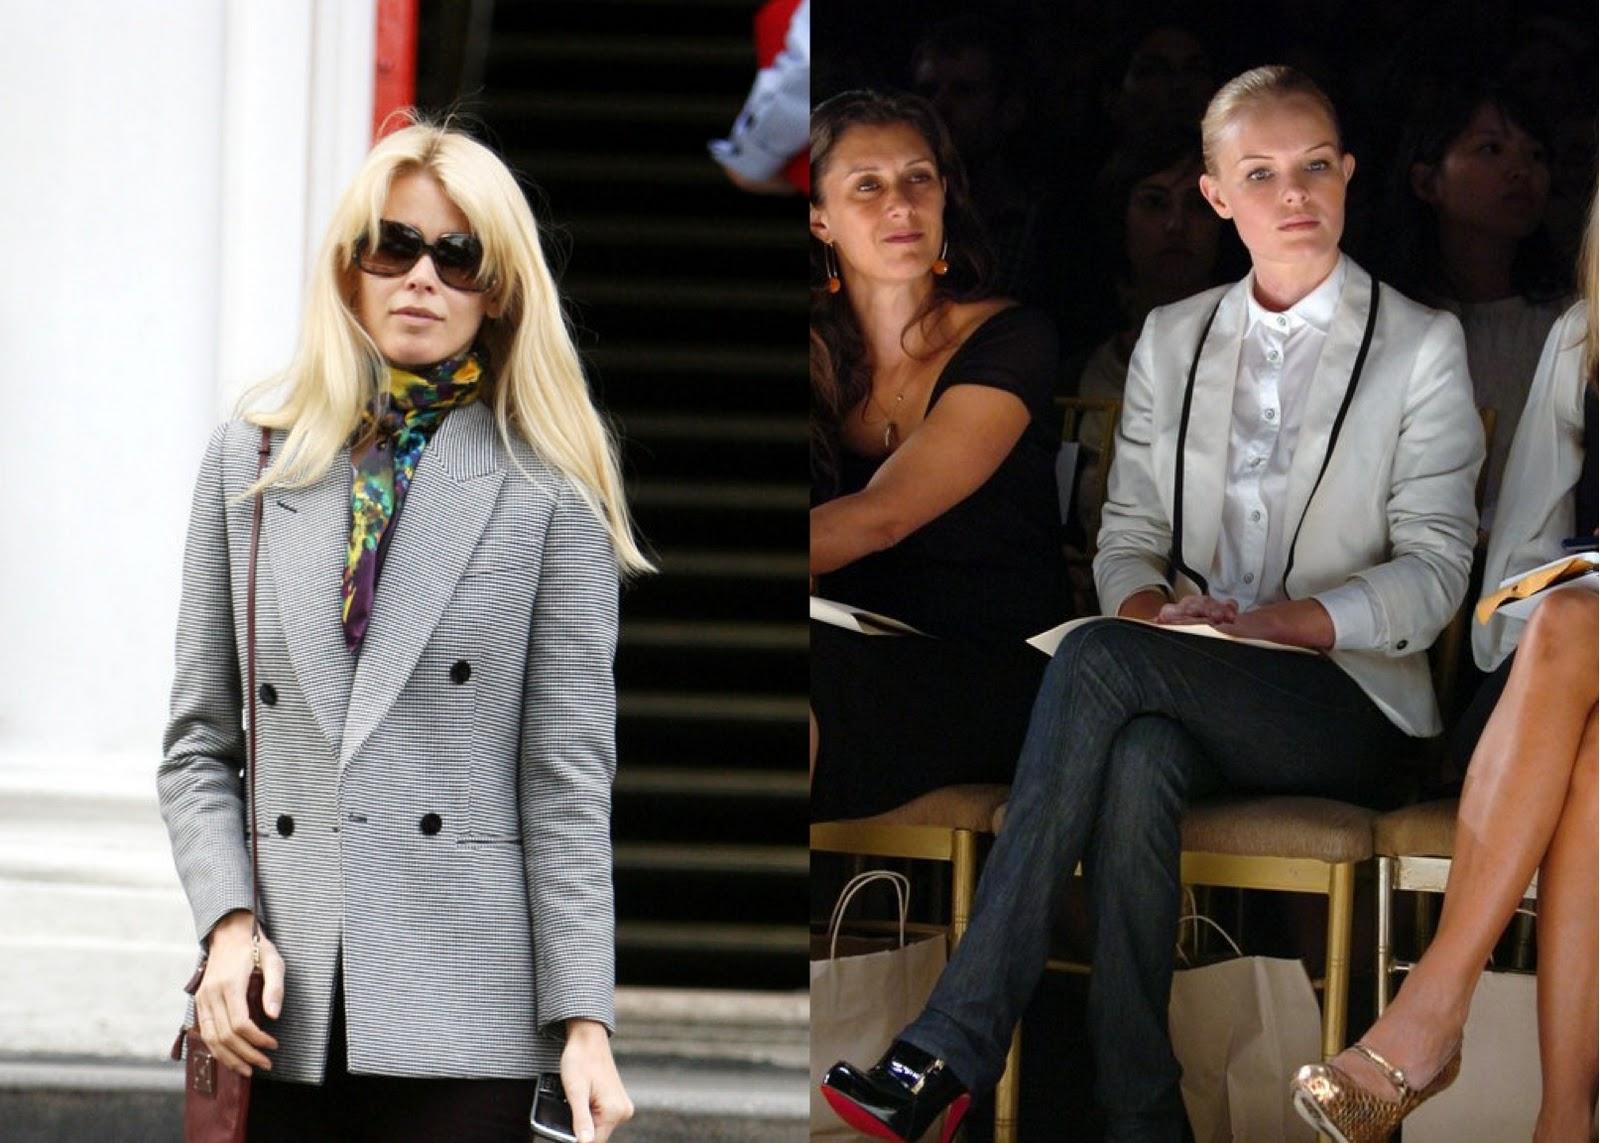 http://4.bp.blogspot.com/_PfmV3qvy8FY/TUZU7ysTQzI/AAAAAAAABYE/pSUbeIsag9A/s1600/la+modella+mafia+Claudia+Schiffer+%2526+Kate+Bosworth.jpg